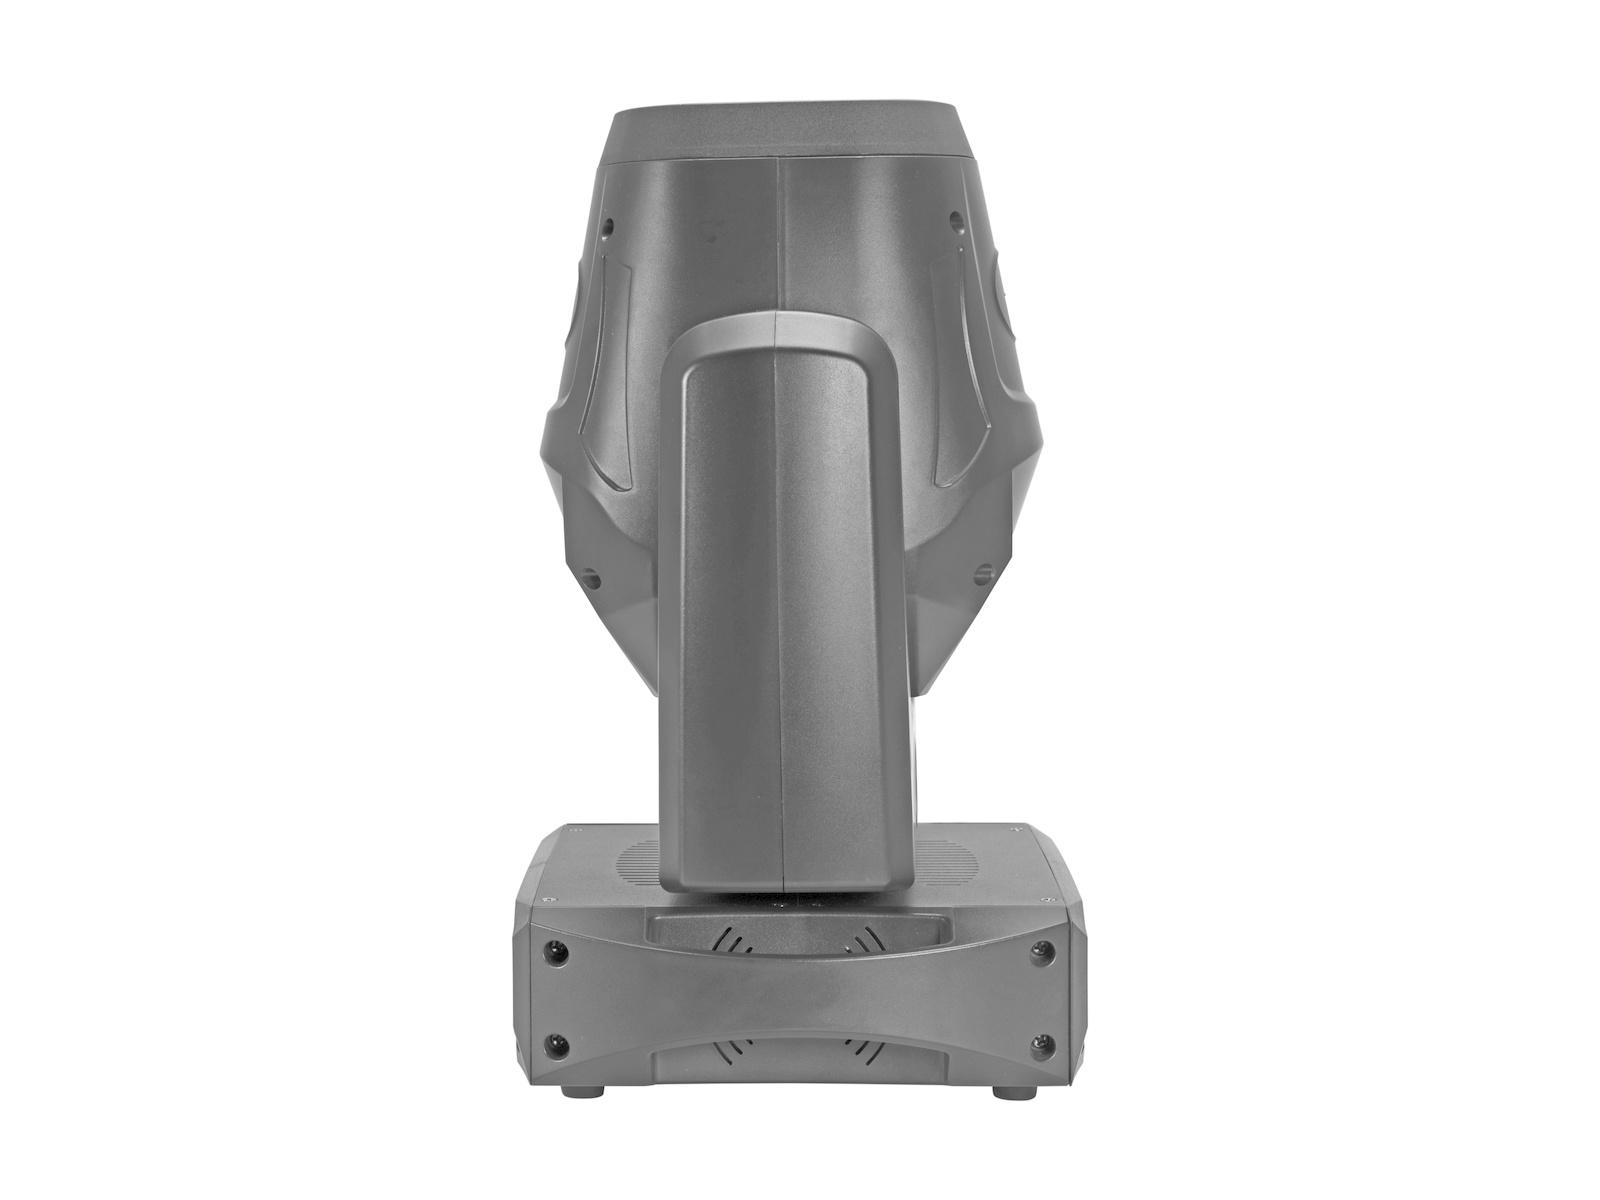 EUROLITE EUROLITE LED TMH-S90 Moving-Head Spot